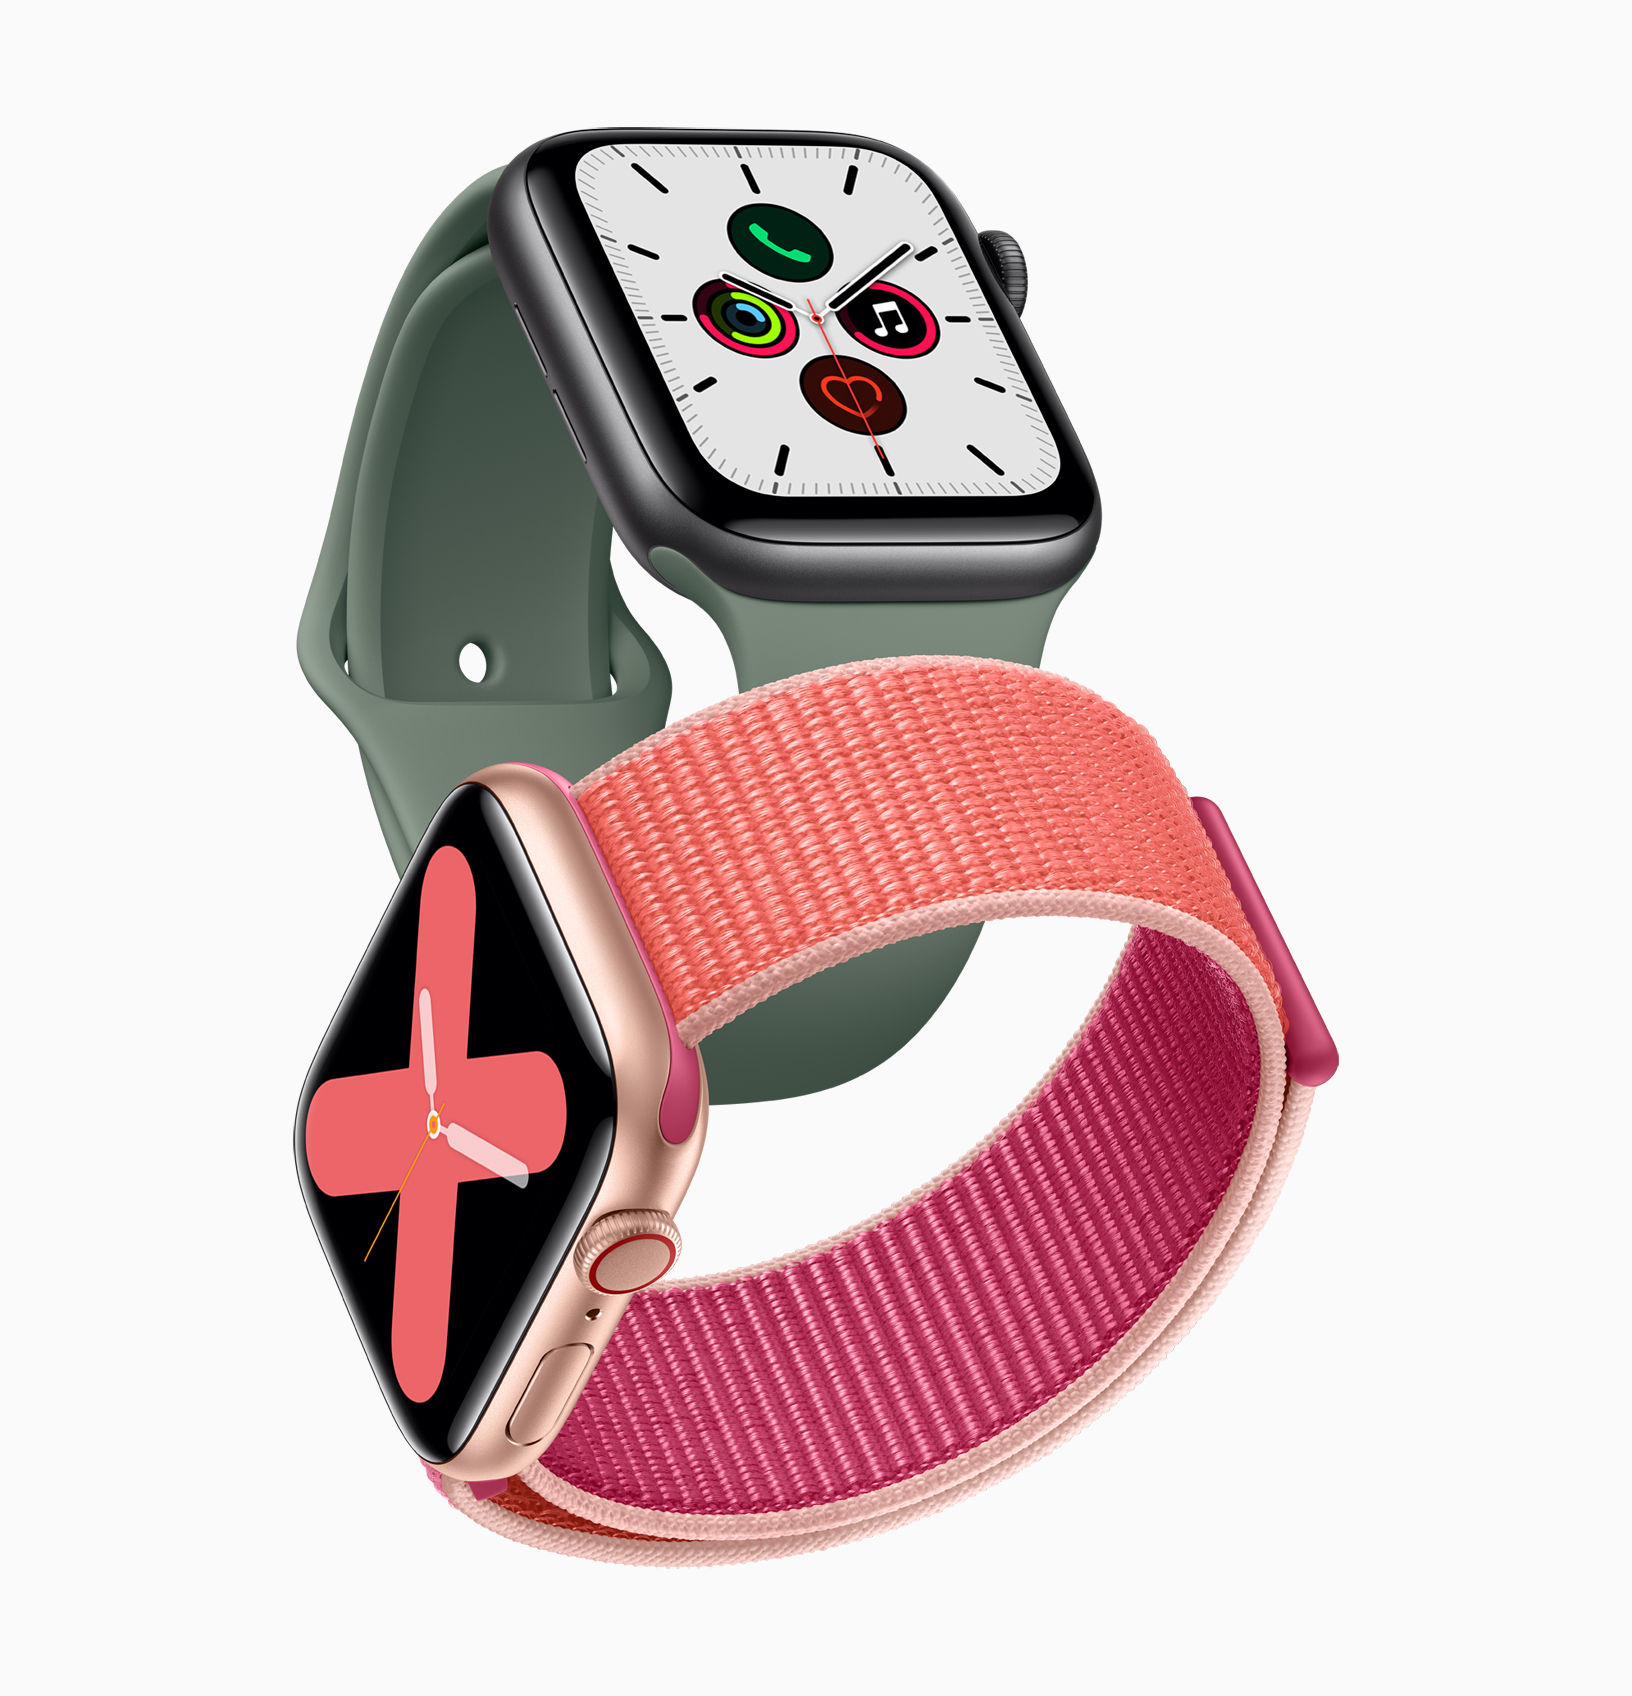 Apple Watch السلسلة 5 مع عرض Always On Retina ، تبدأ الأسعار من 40900 روبية 1